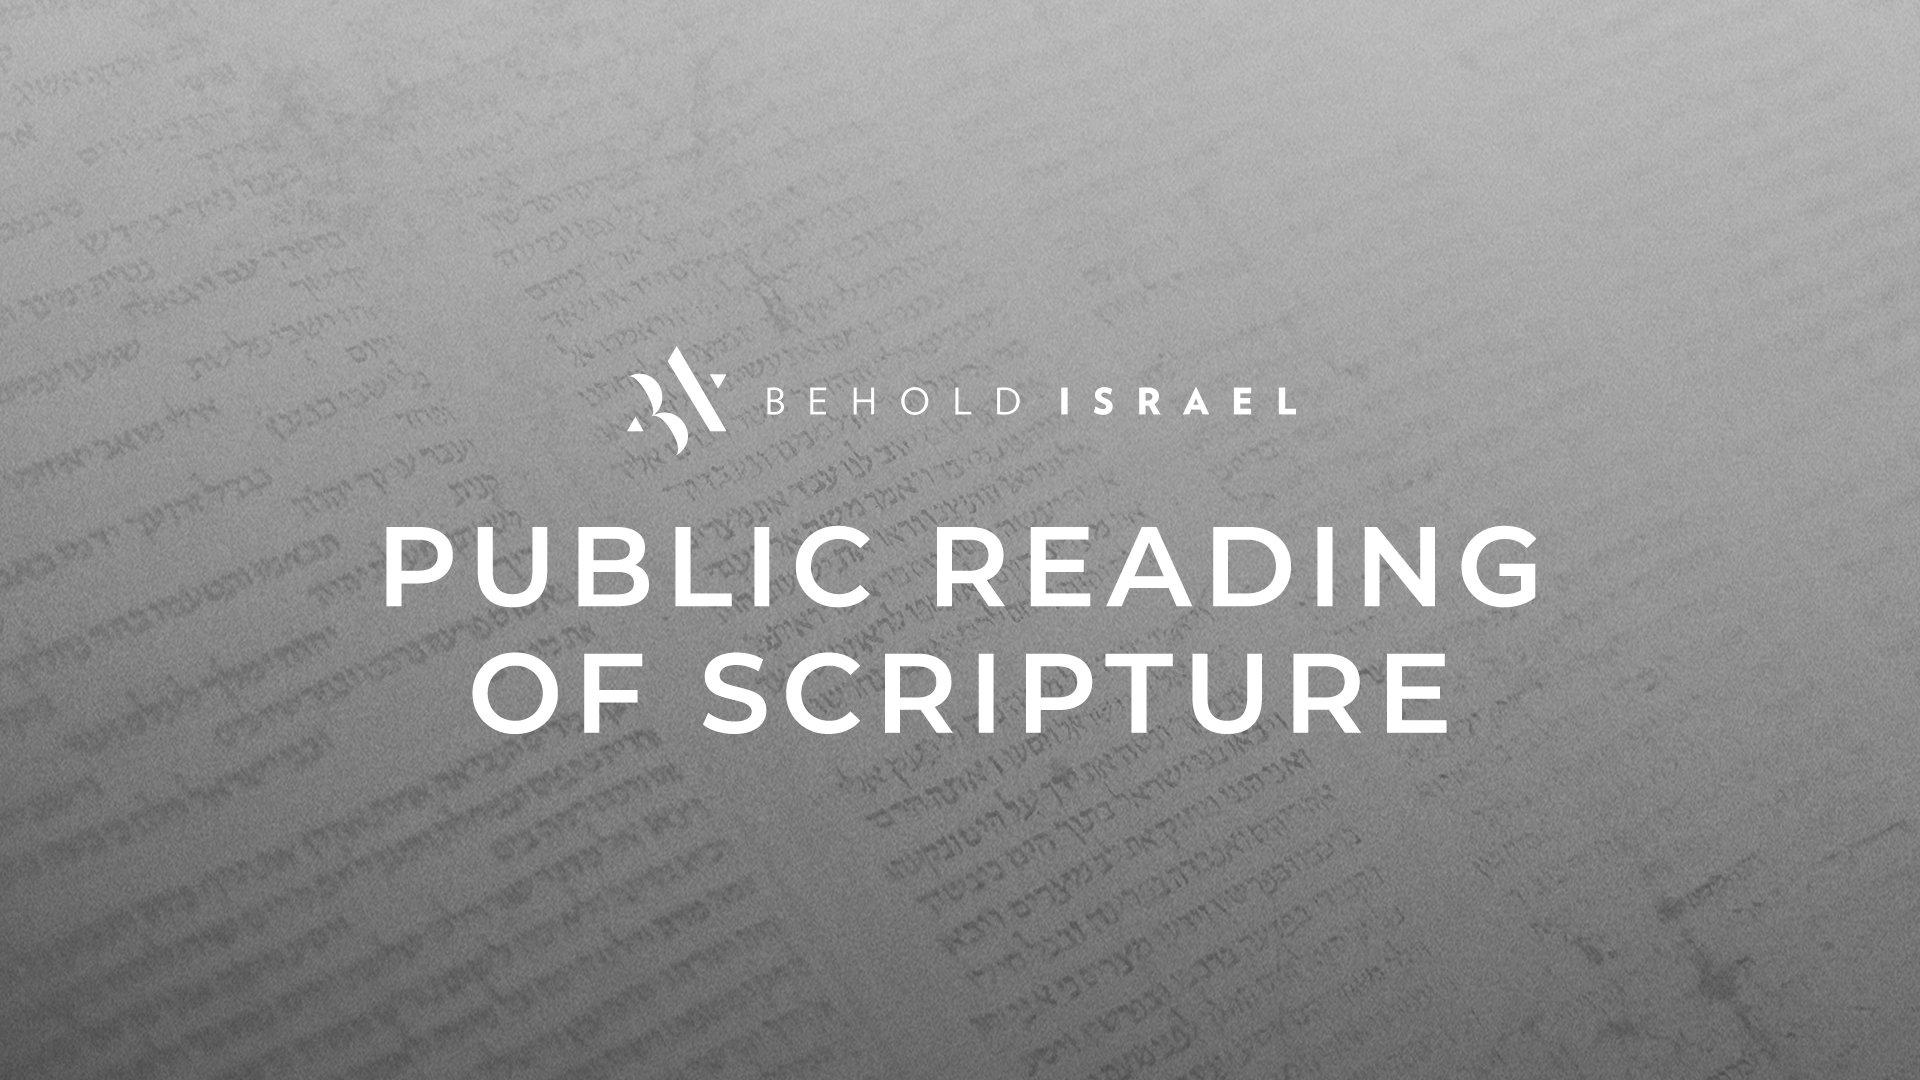 Public Scripture Reading Live on Facebook